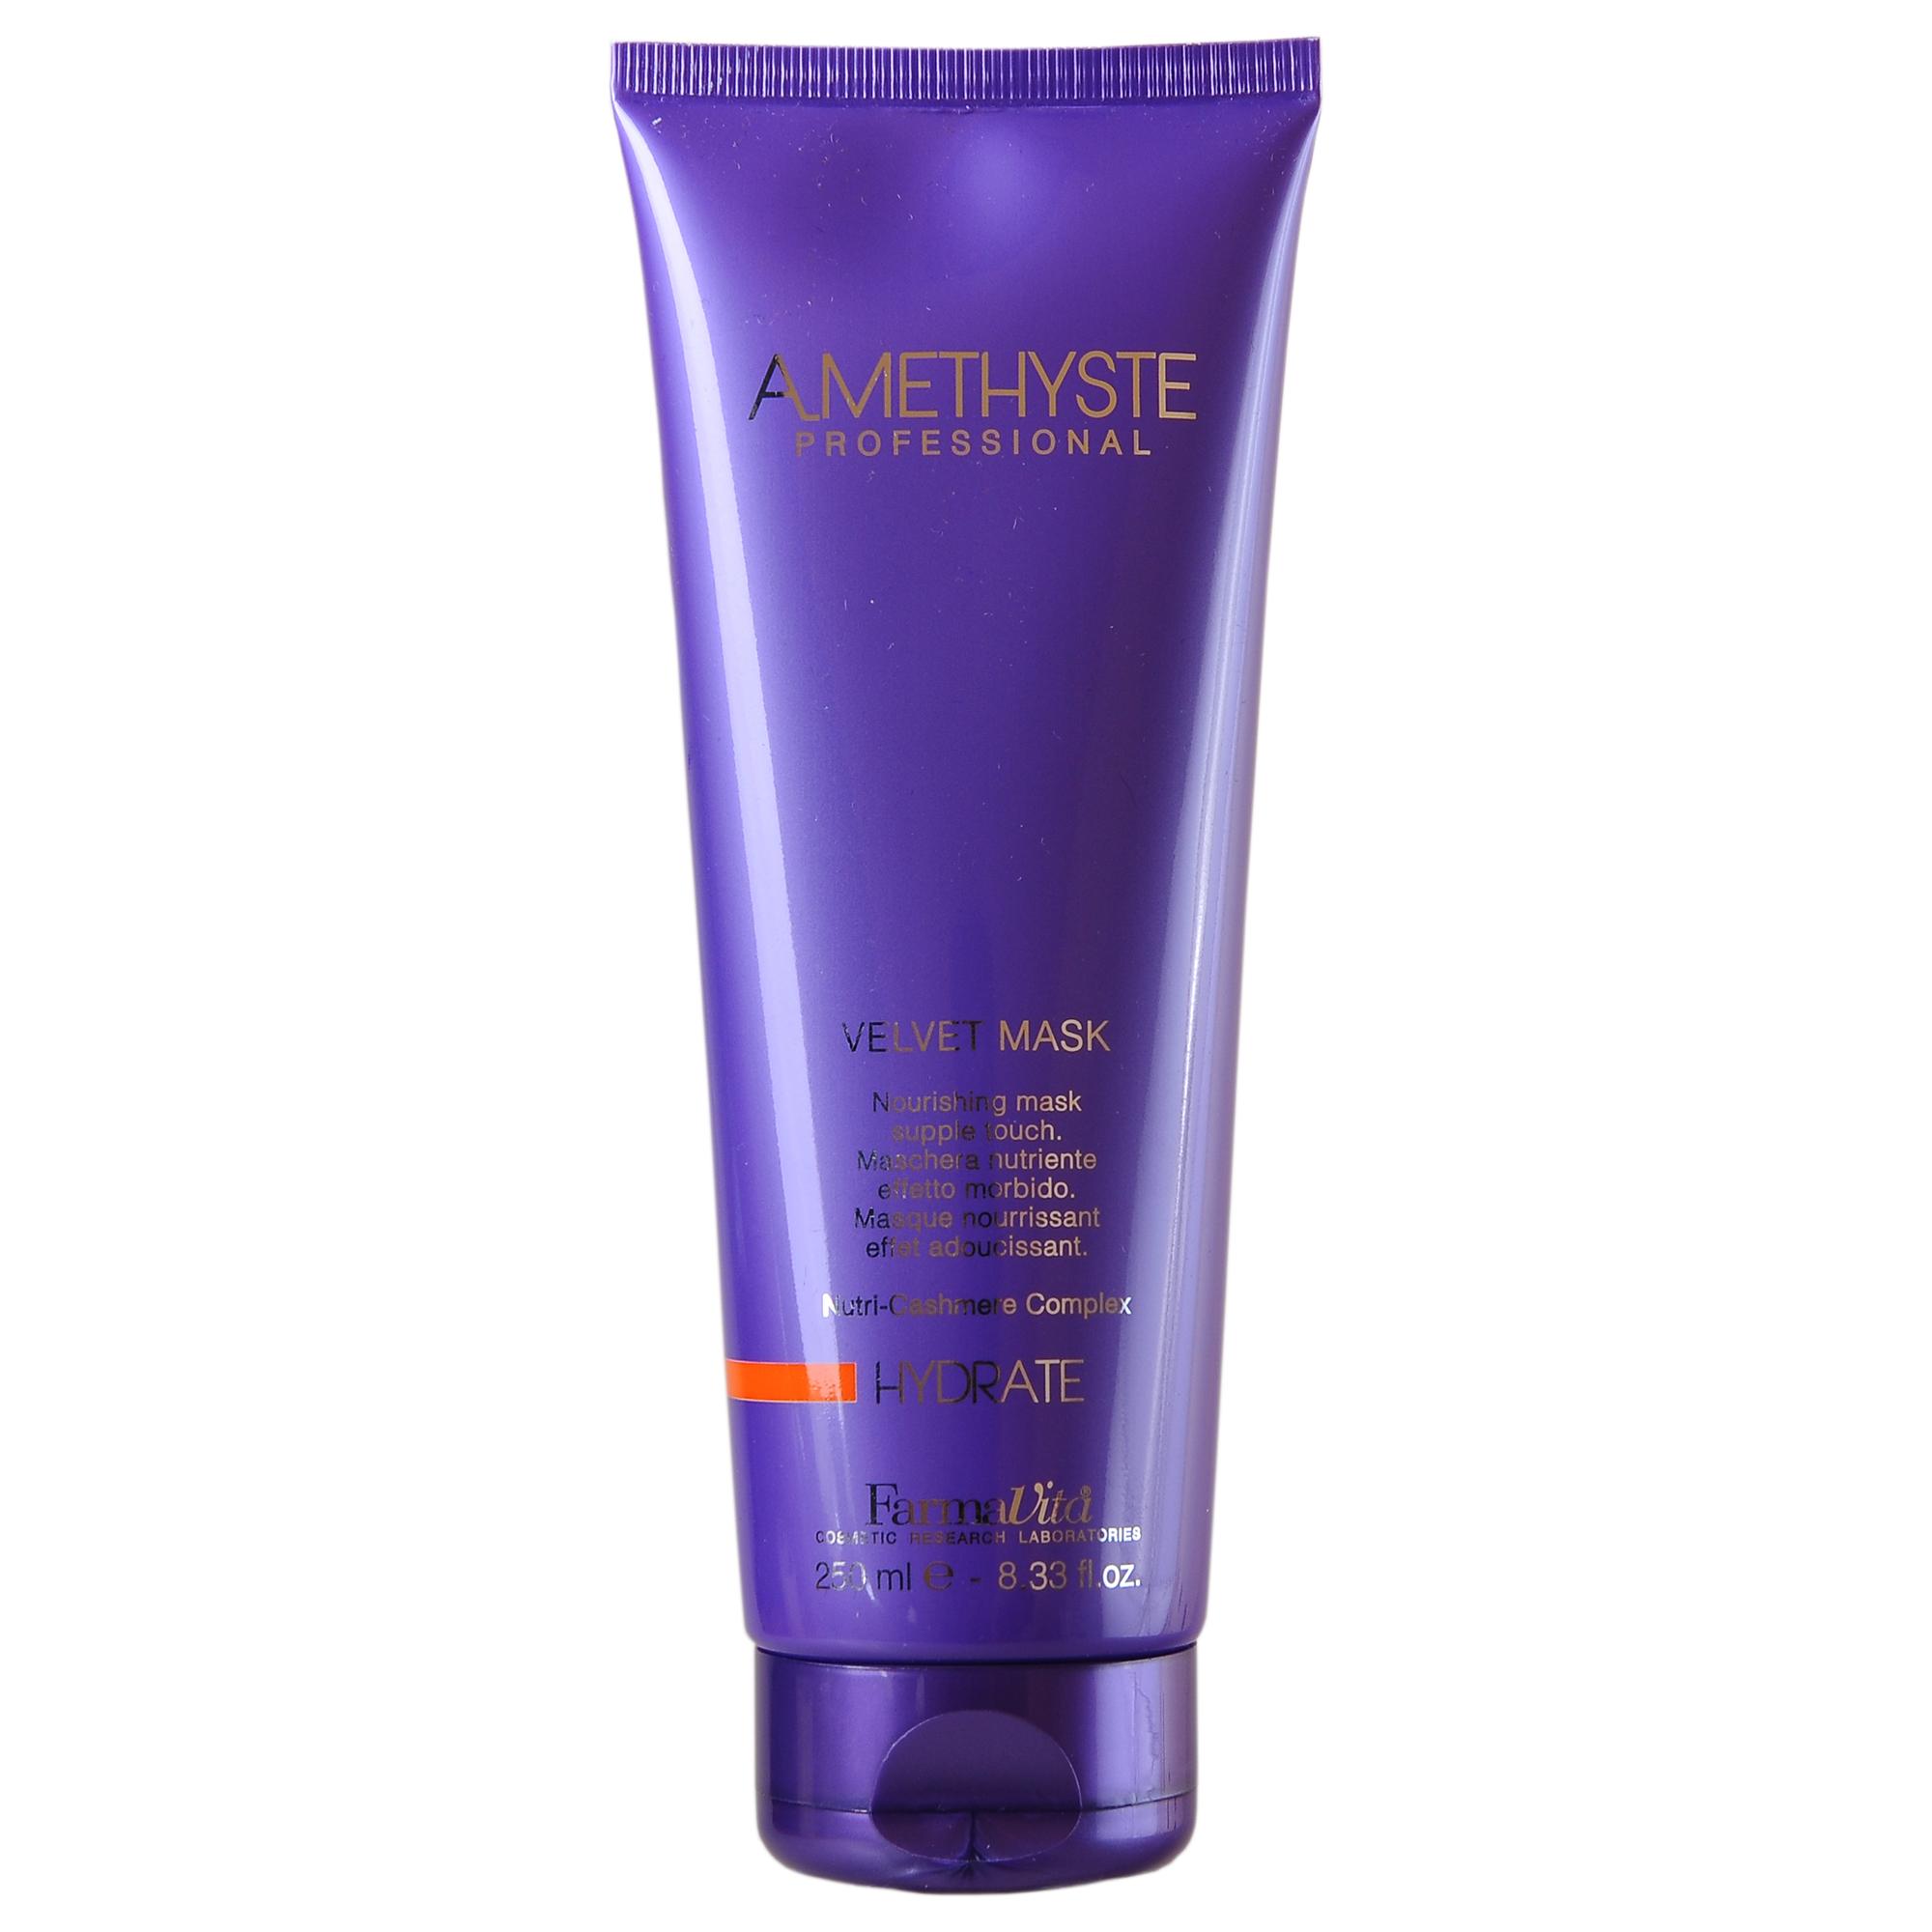 FARMAVITA Маска питат д/сухих и ослабленных волос Amethyste hydrate shampoo / AMETHYSTE PROFESSIONAL 250 мл